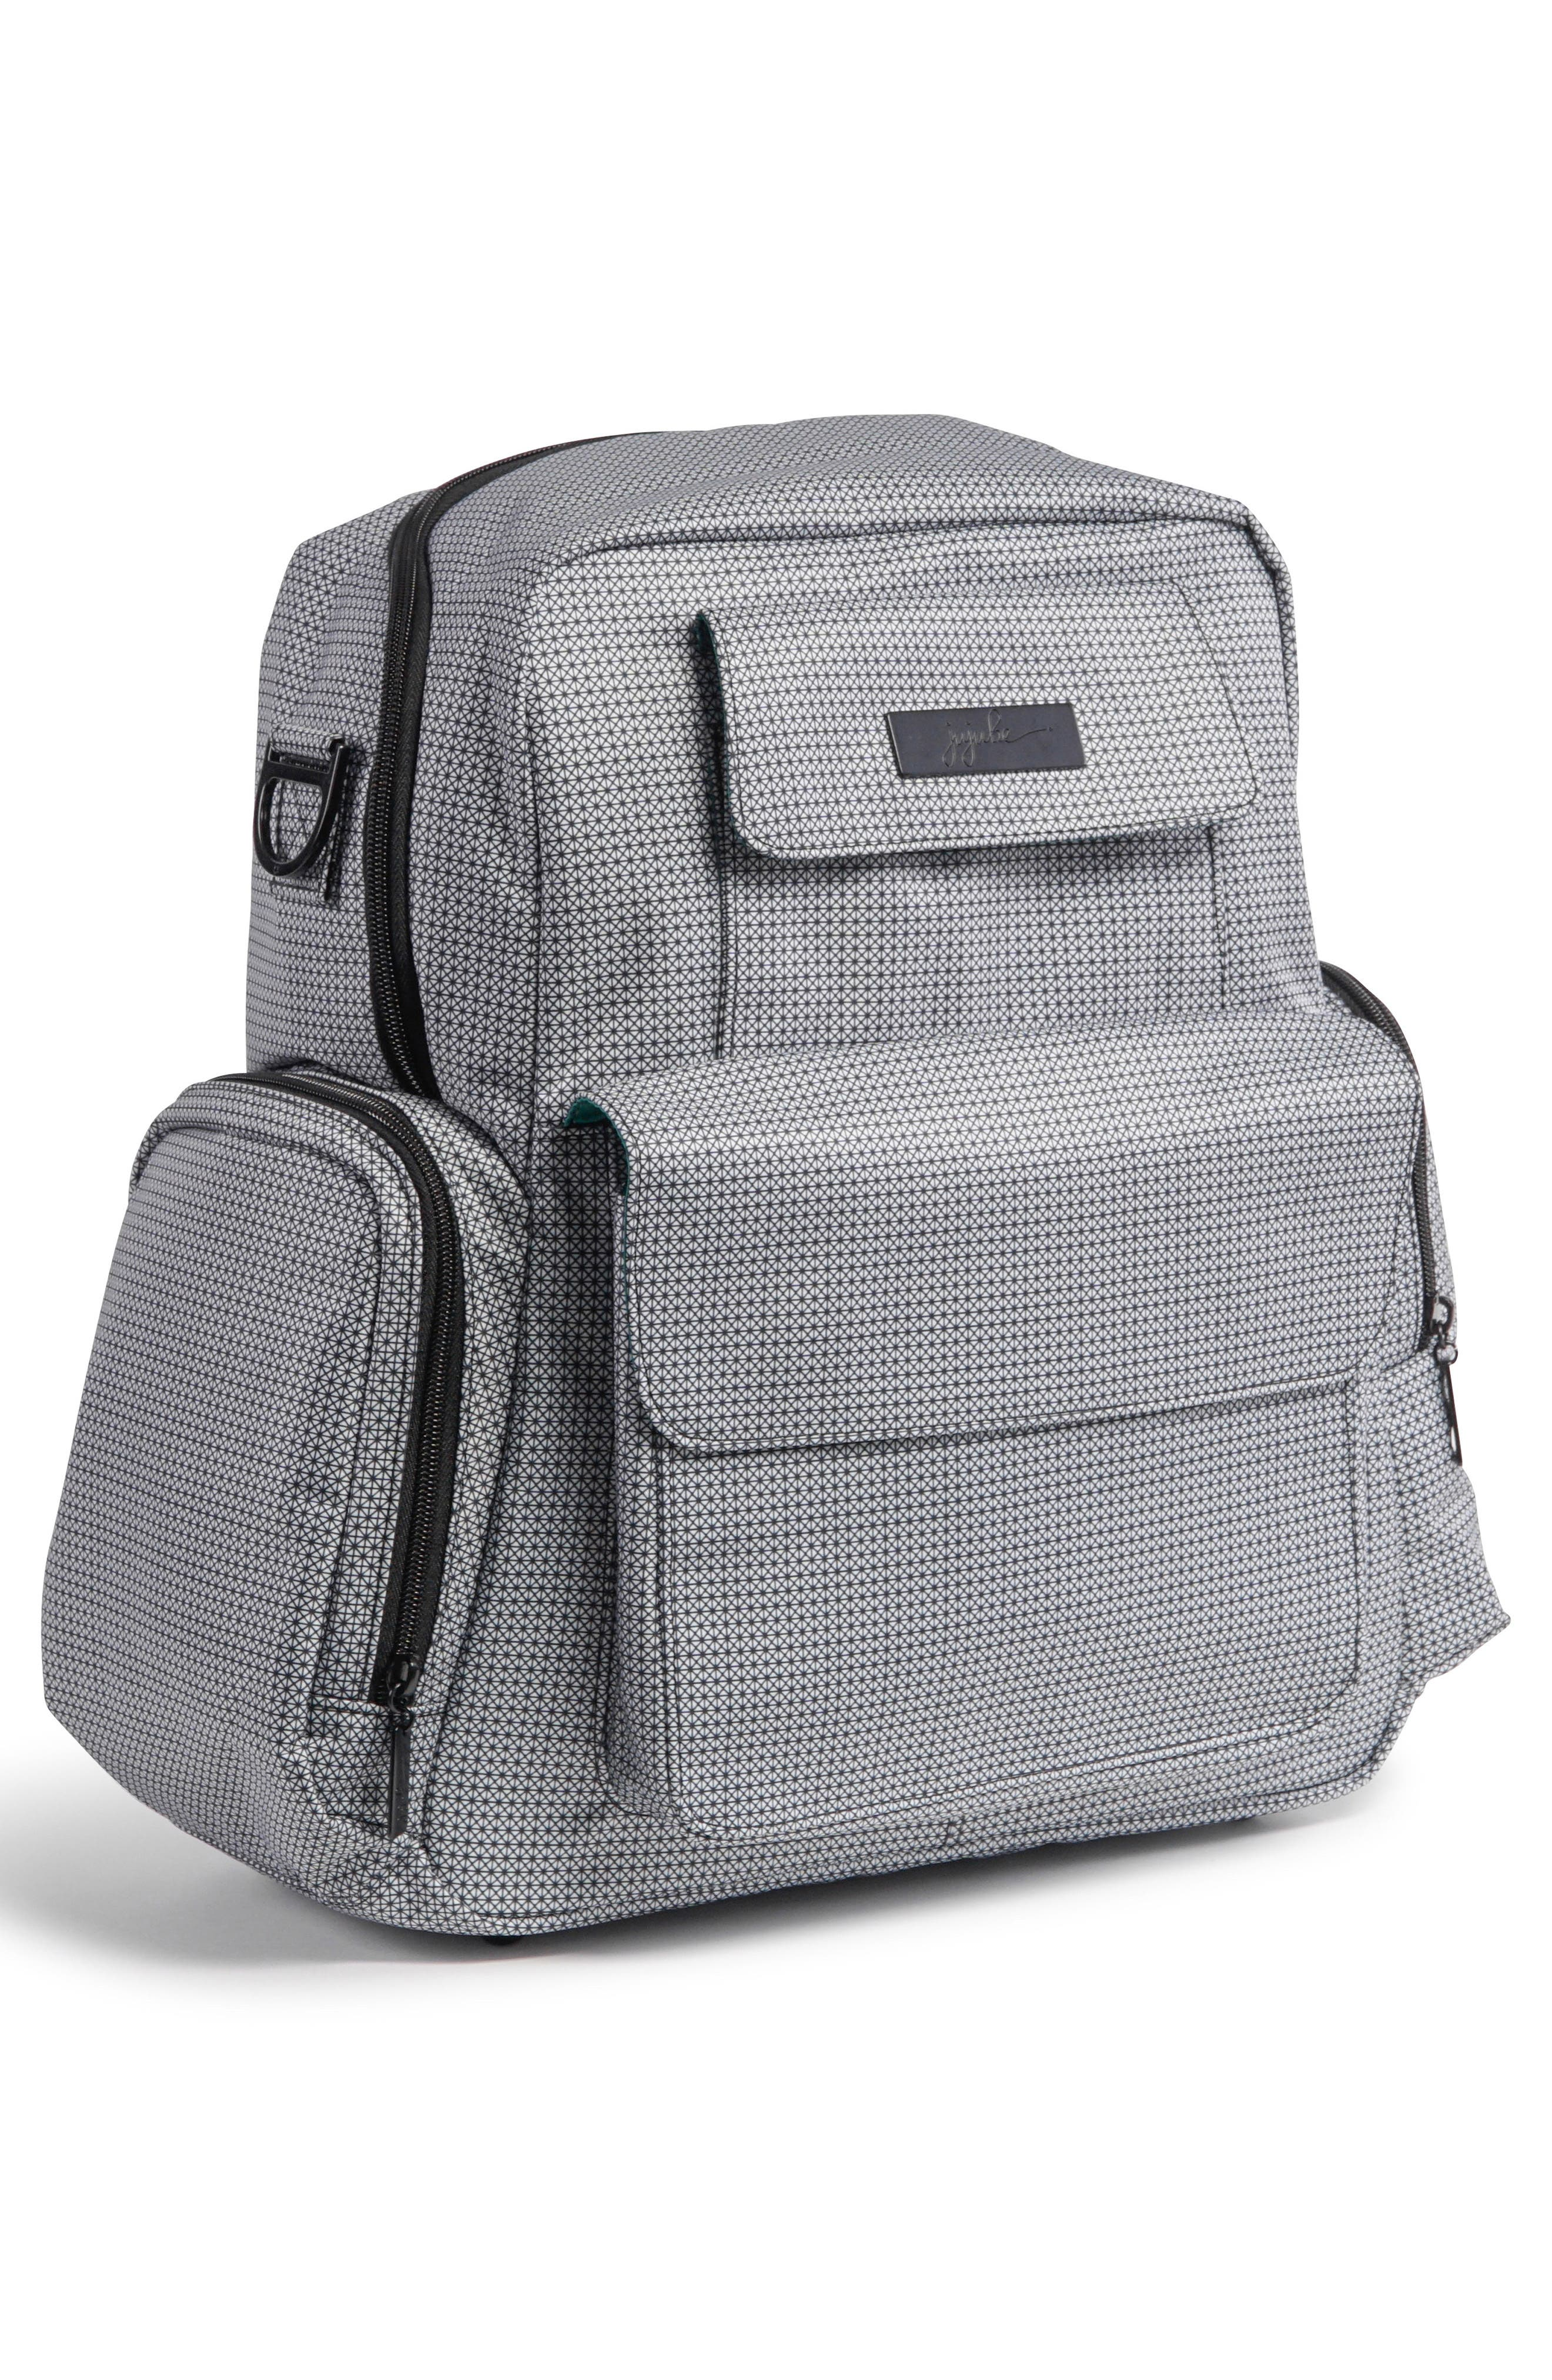 Be Nurtured Pumping Backpack,                             Alternate thumbnail 7, color,                             BLACK MATRIX